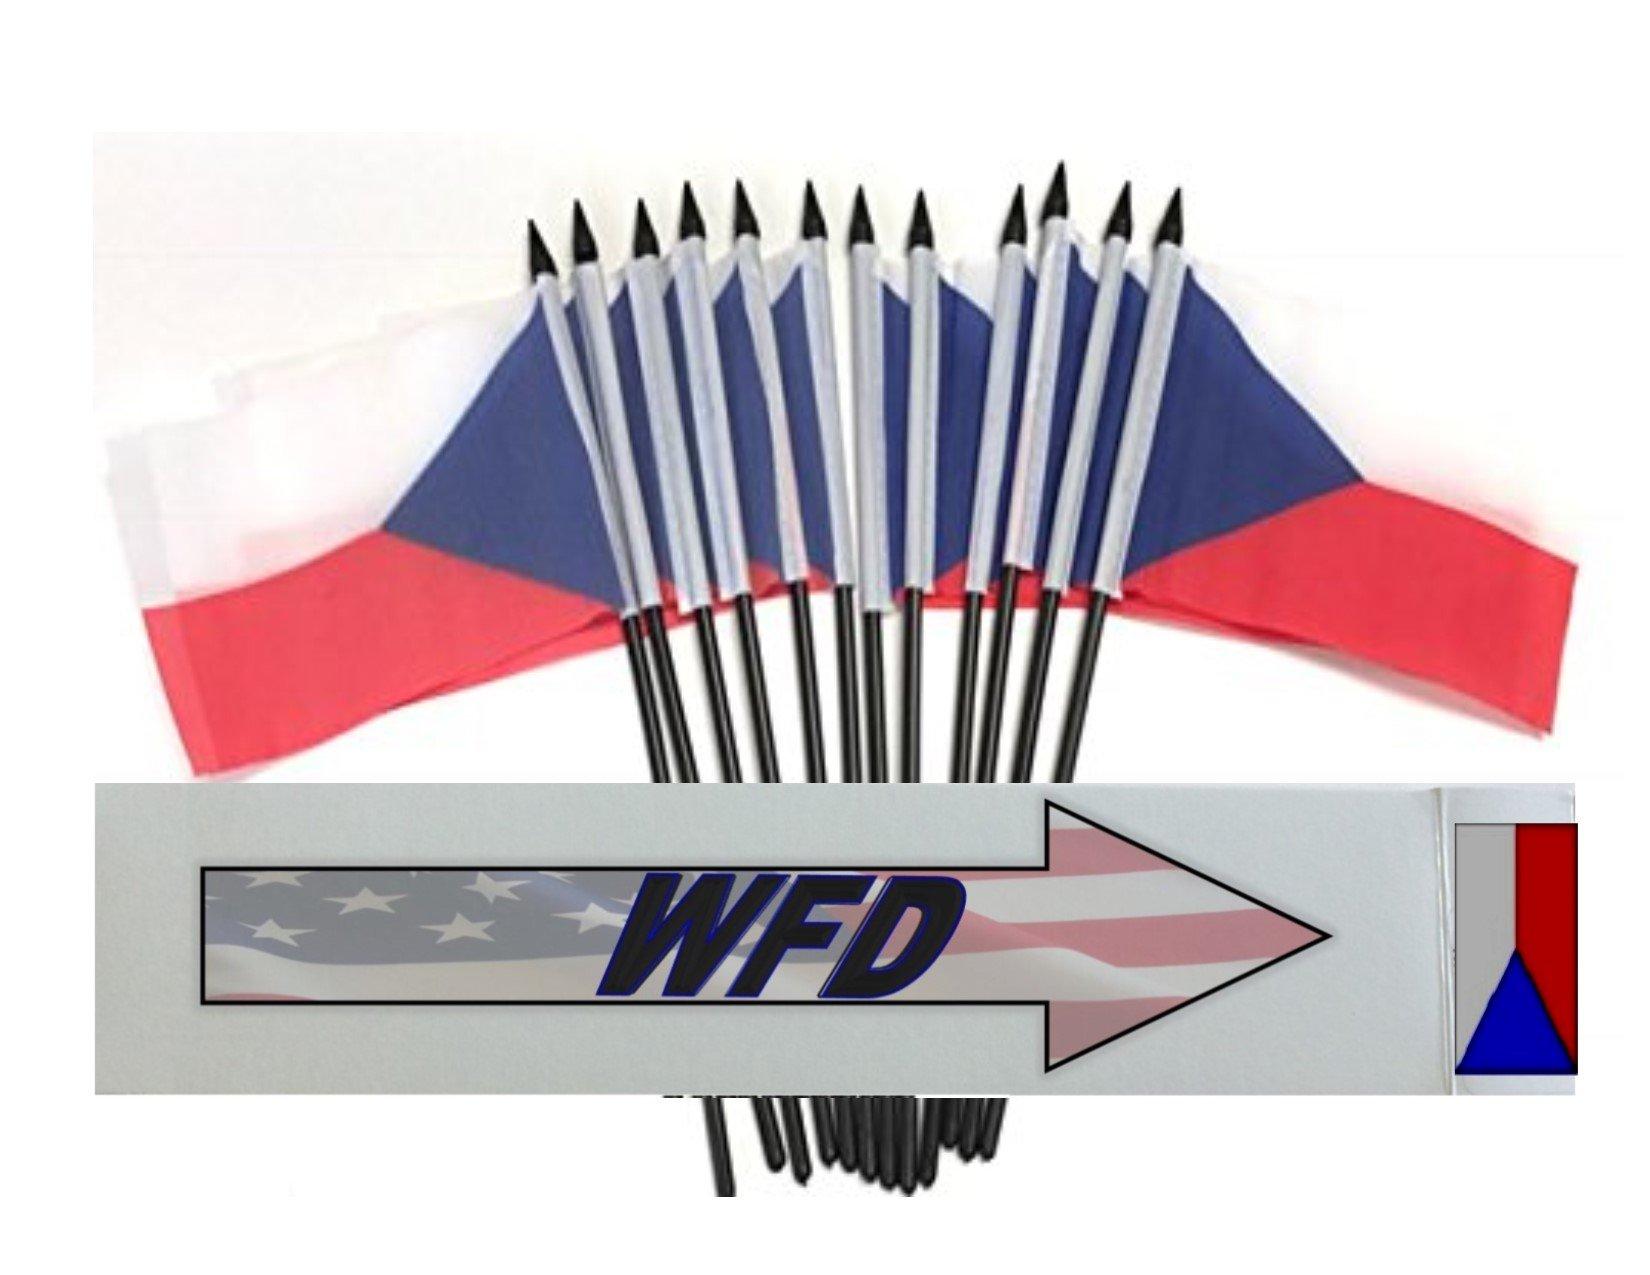 Wholesale Box of 144 4''x6'' Czech Republic Polyester Miniature Desk & Little Table Flags, 12 Dozen 4''x 6'' Czech Small Mini Handheld Waving Stick Flag